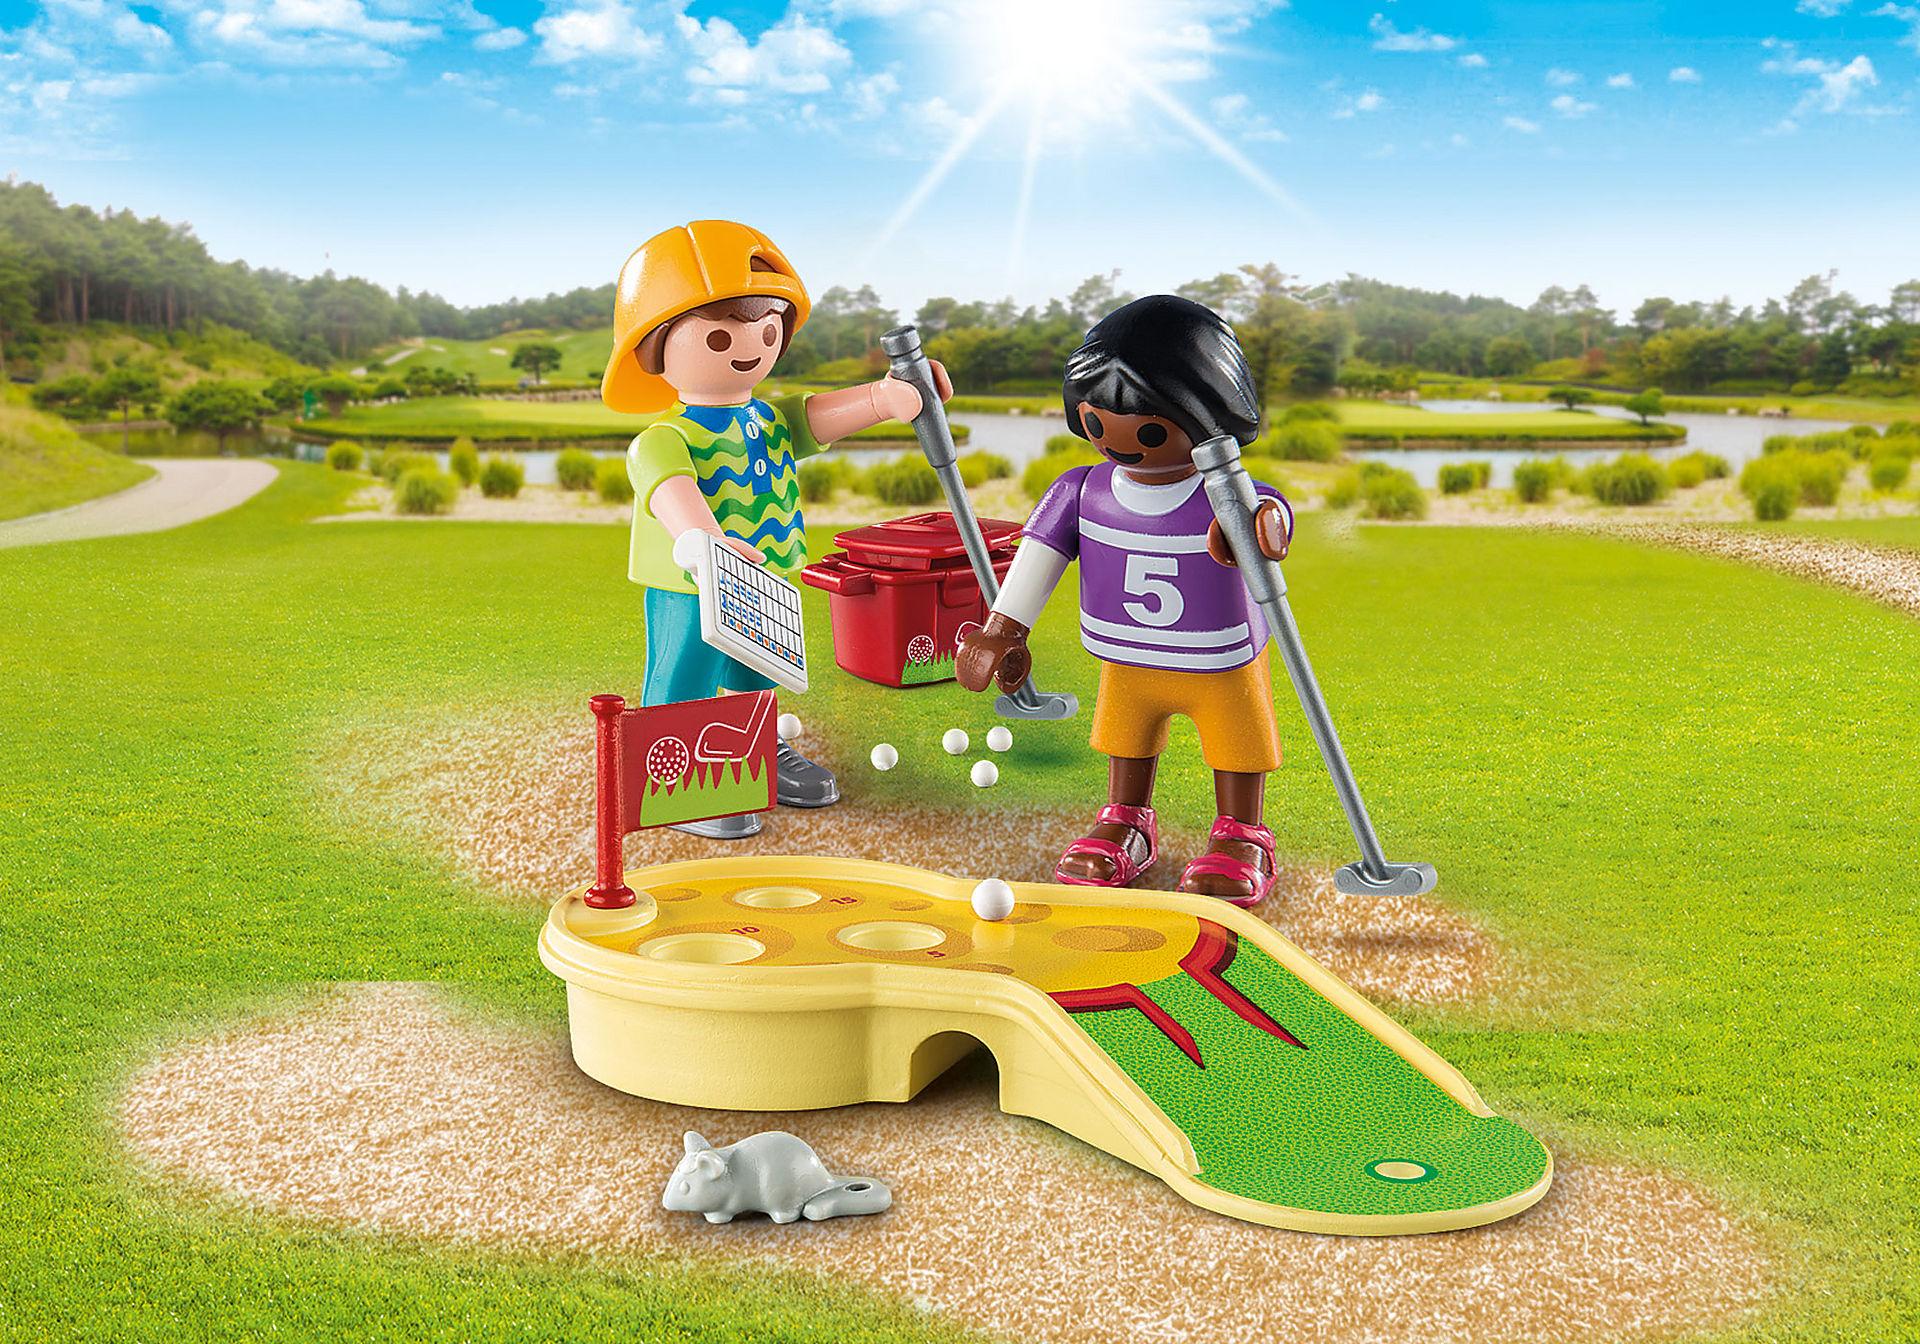 http://media.playmobil.com/i/playmobil/9439_product_detail/Børn ved minigolfspil